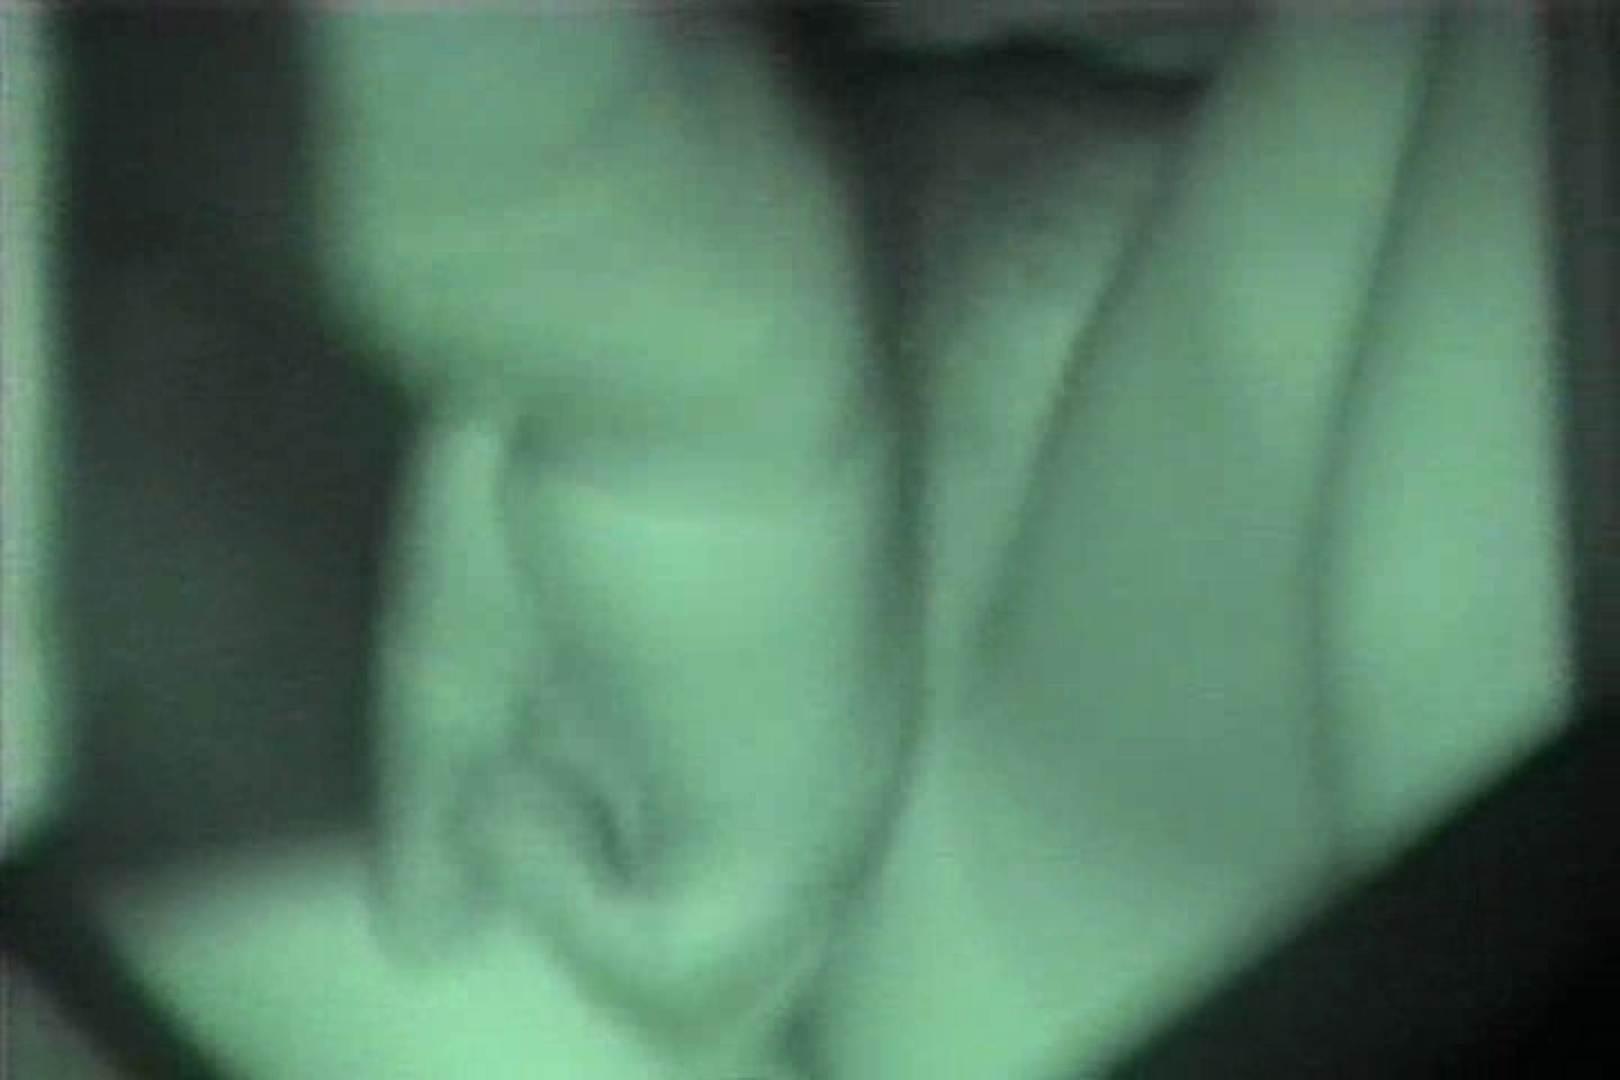 MASAさんの待ち伏せ撮り! 赤外線カーセックスVol.7 OLの実態 隠し撮りAV無料 60pic 38